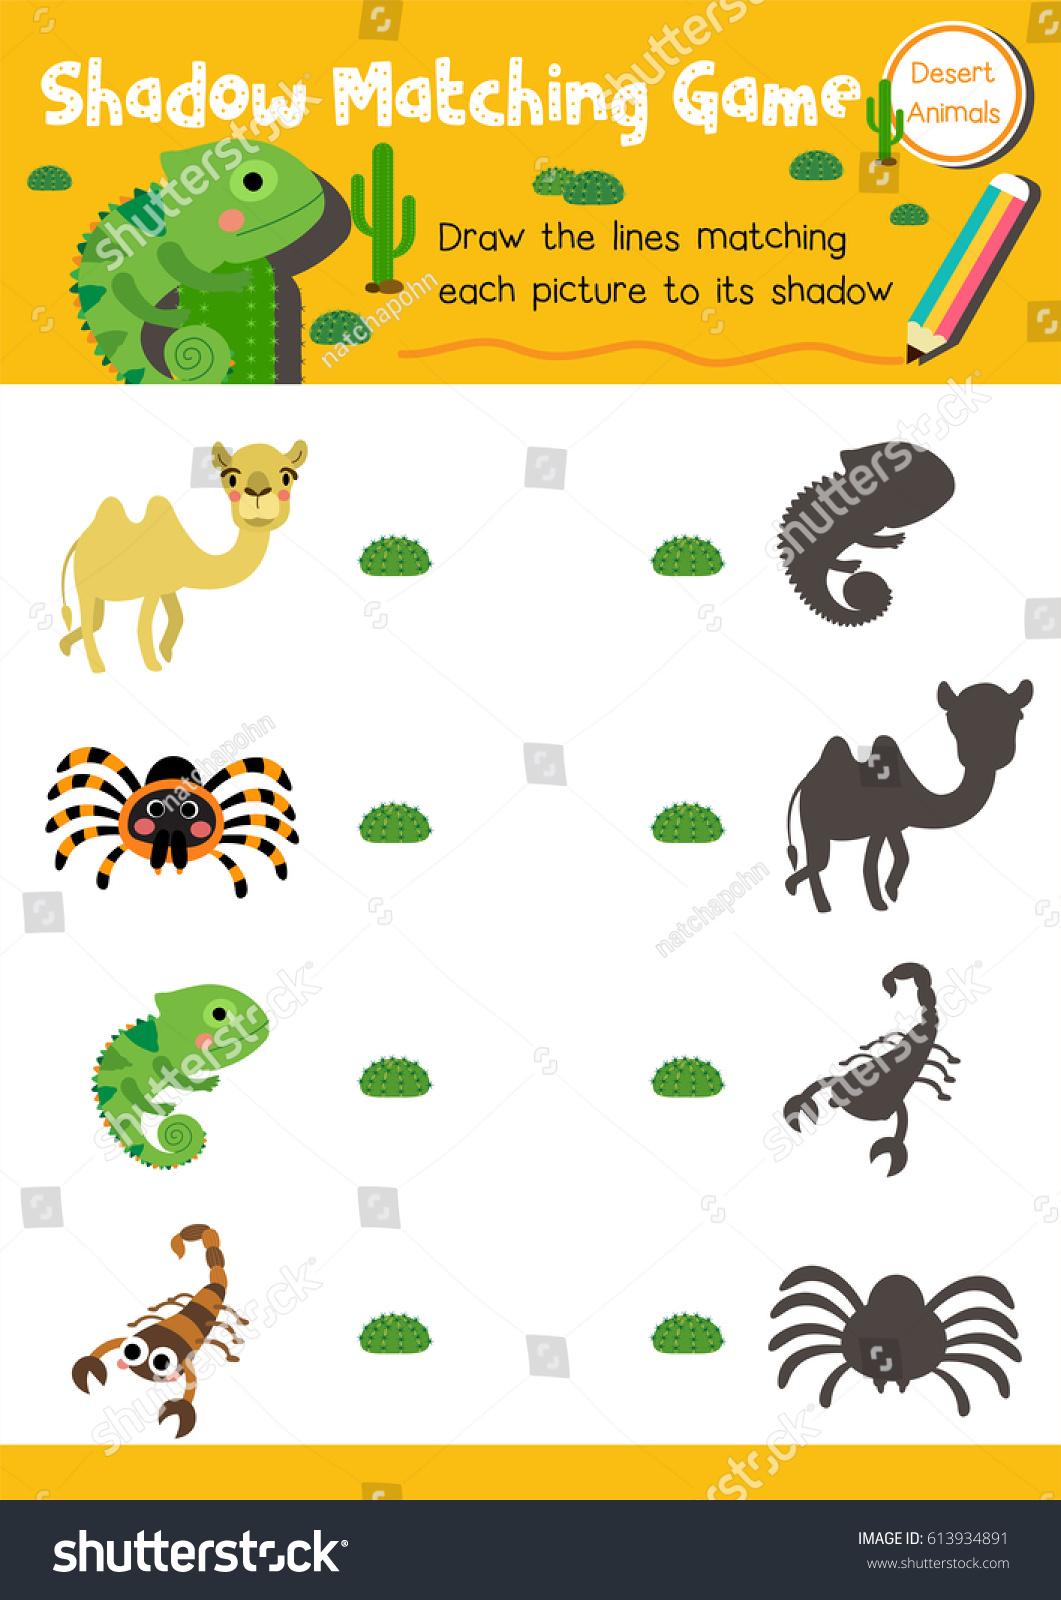 Worksheet Animal Adaptations Worksheets For Kids Carlos Lomas